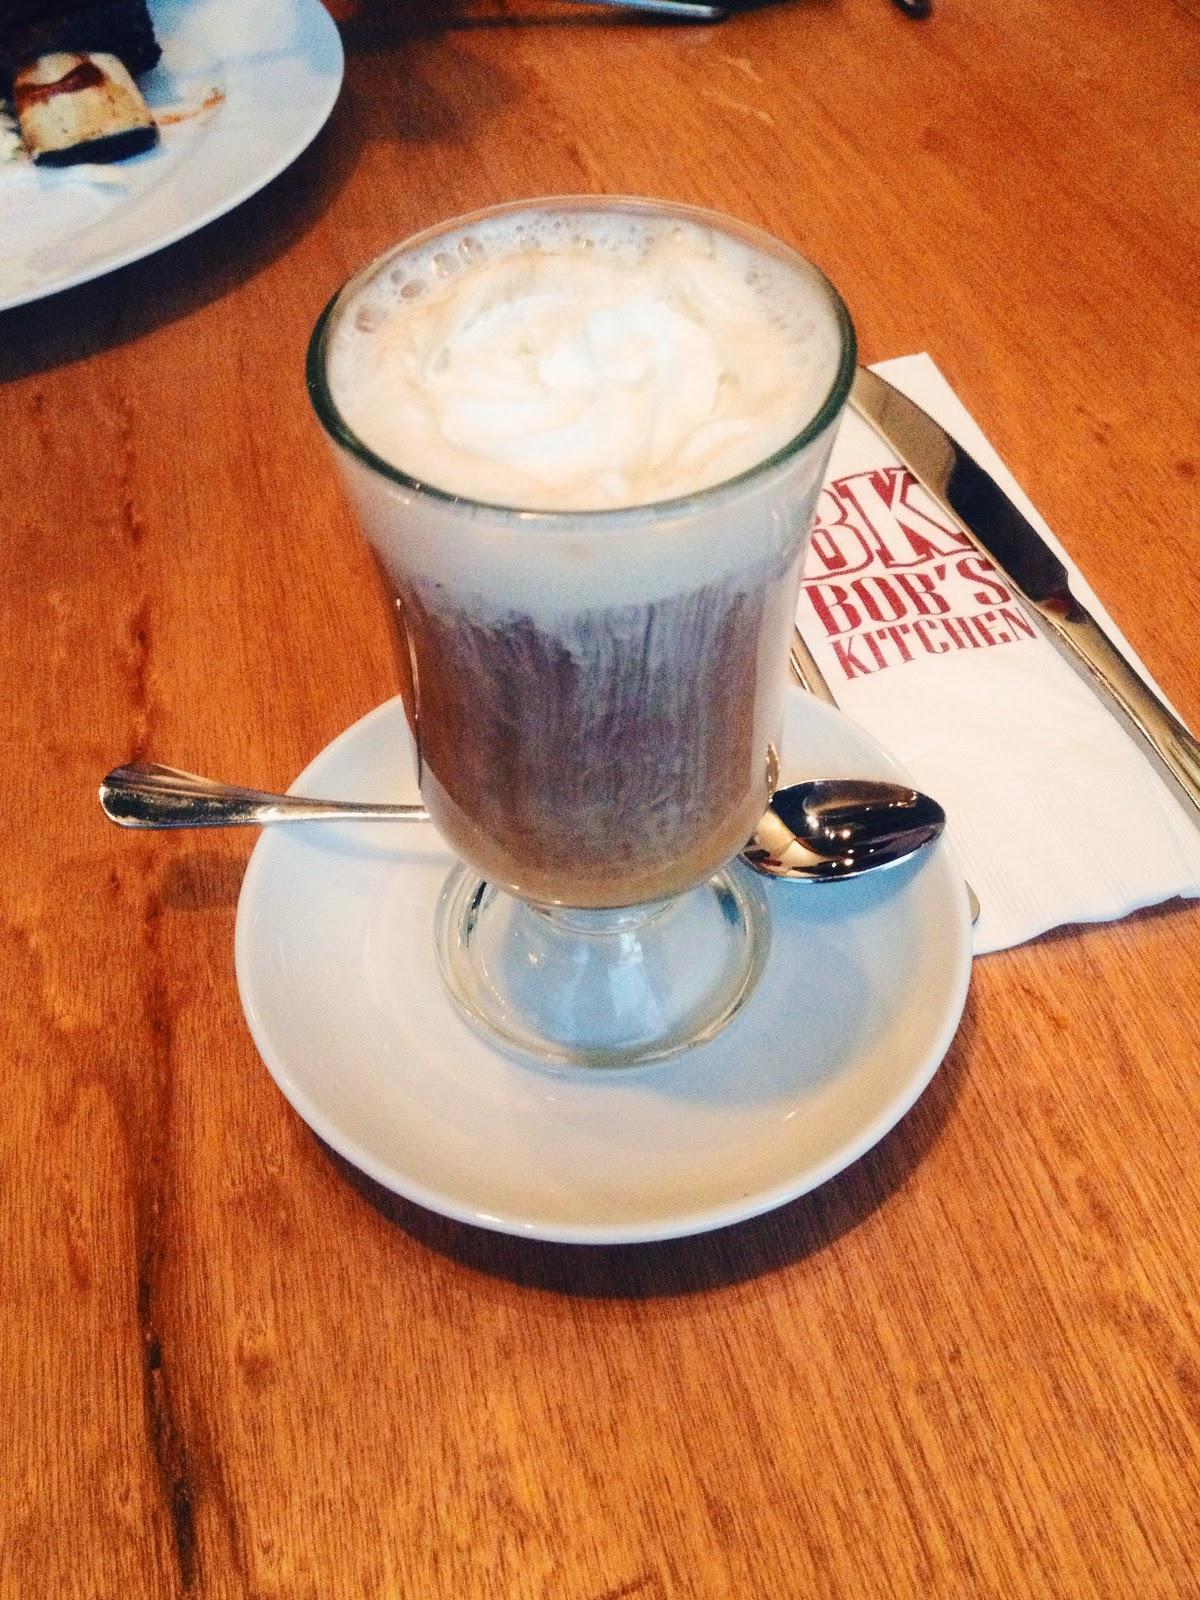 Irish Coffee Liquors - Bob's Kitchen @ Danga Utama, Johor Bahru, Johor, Malaysia